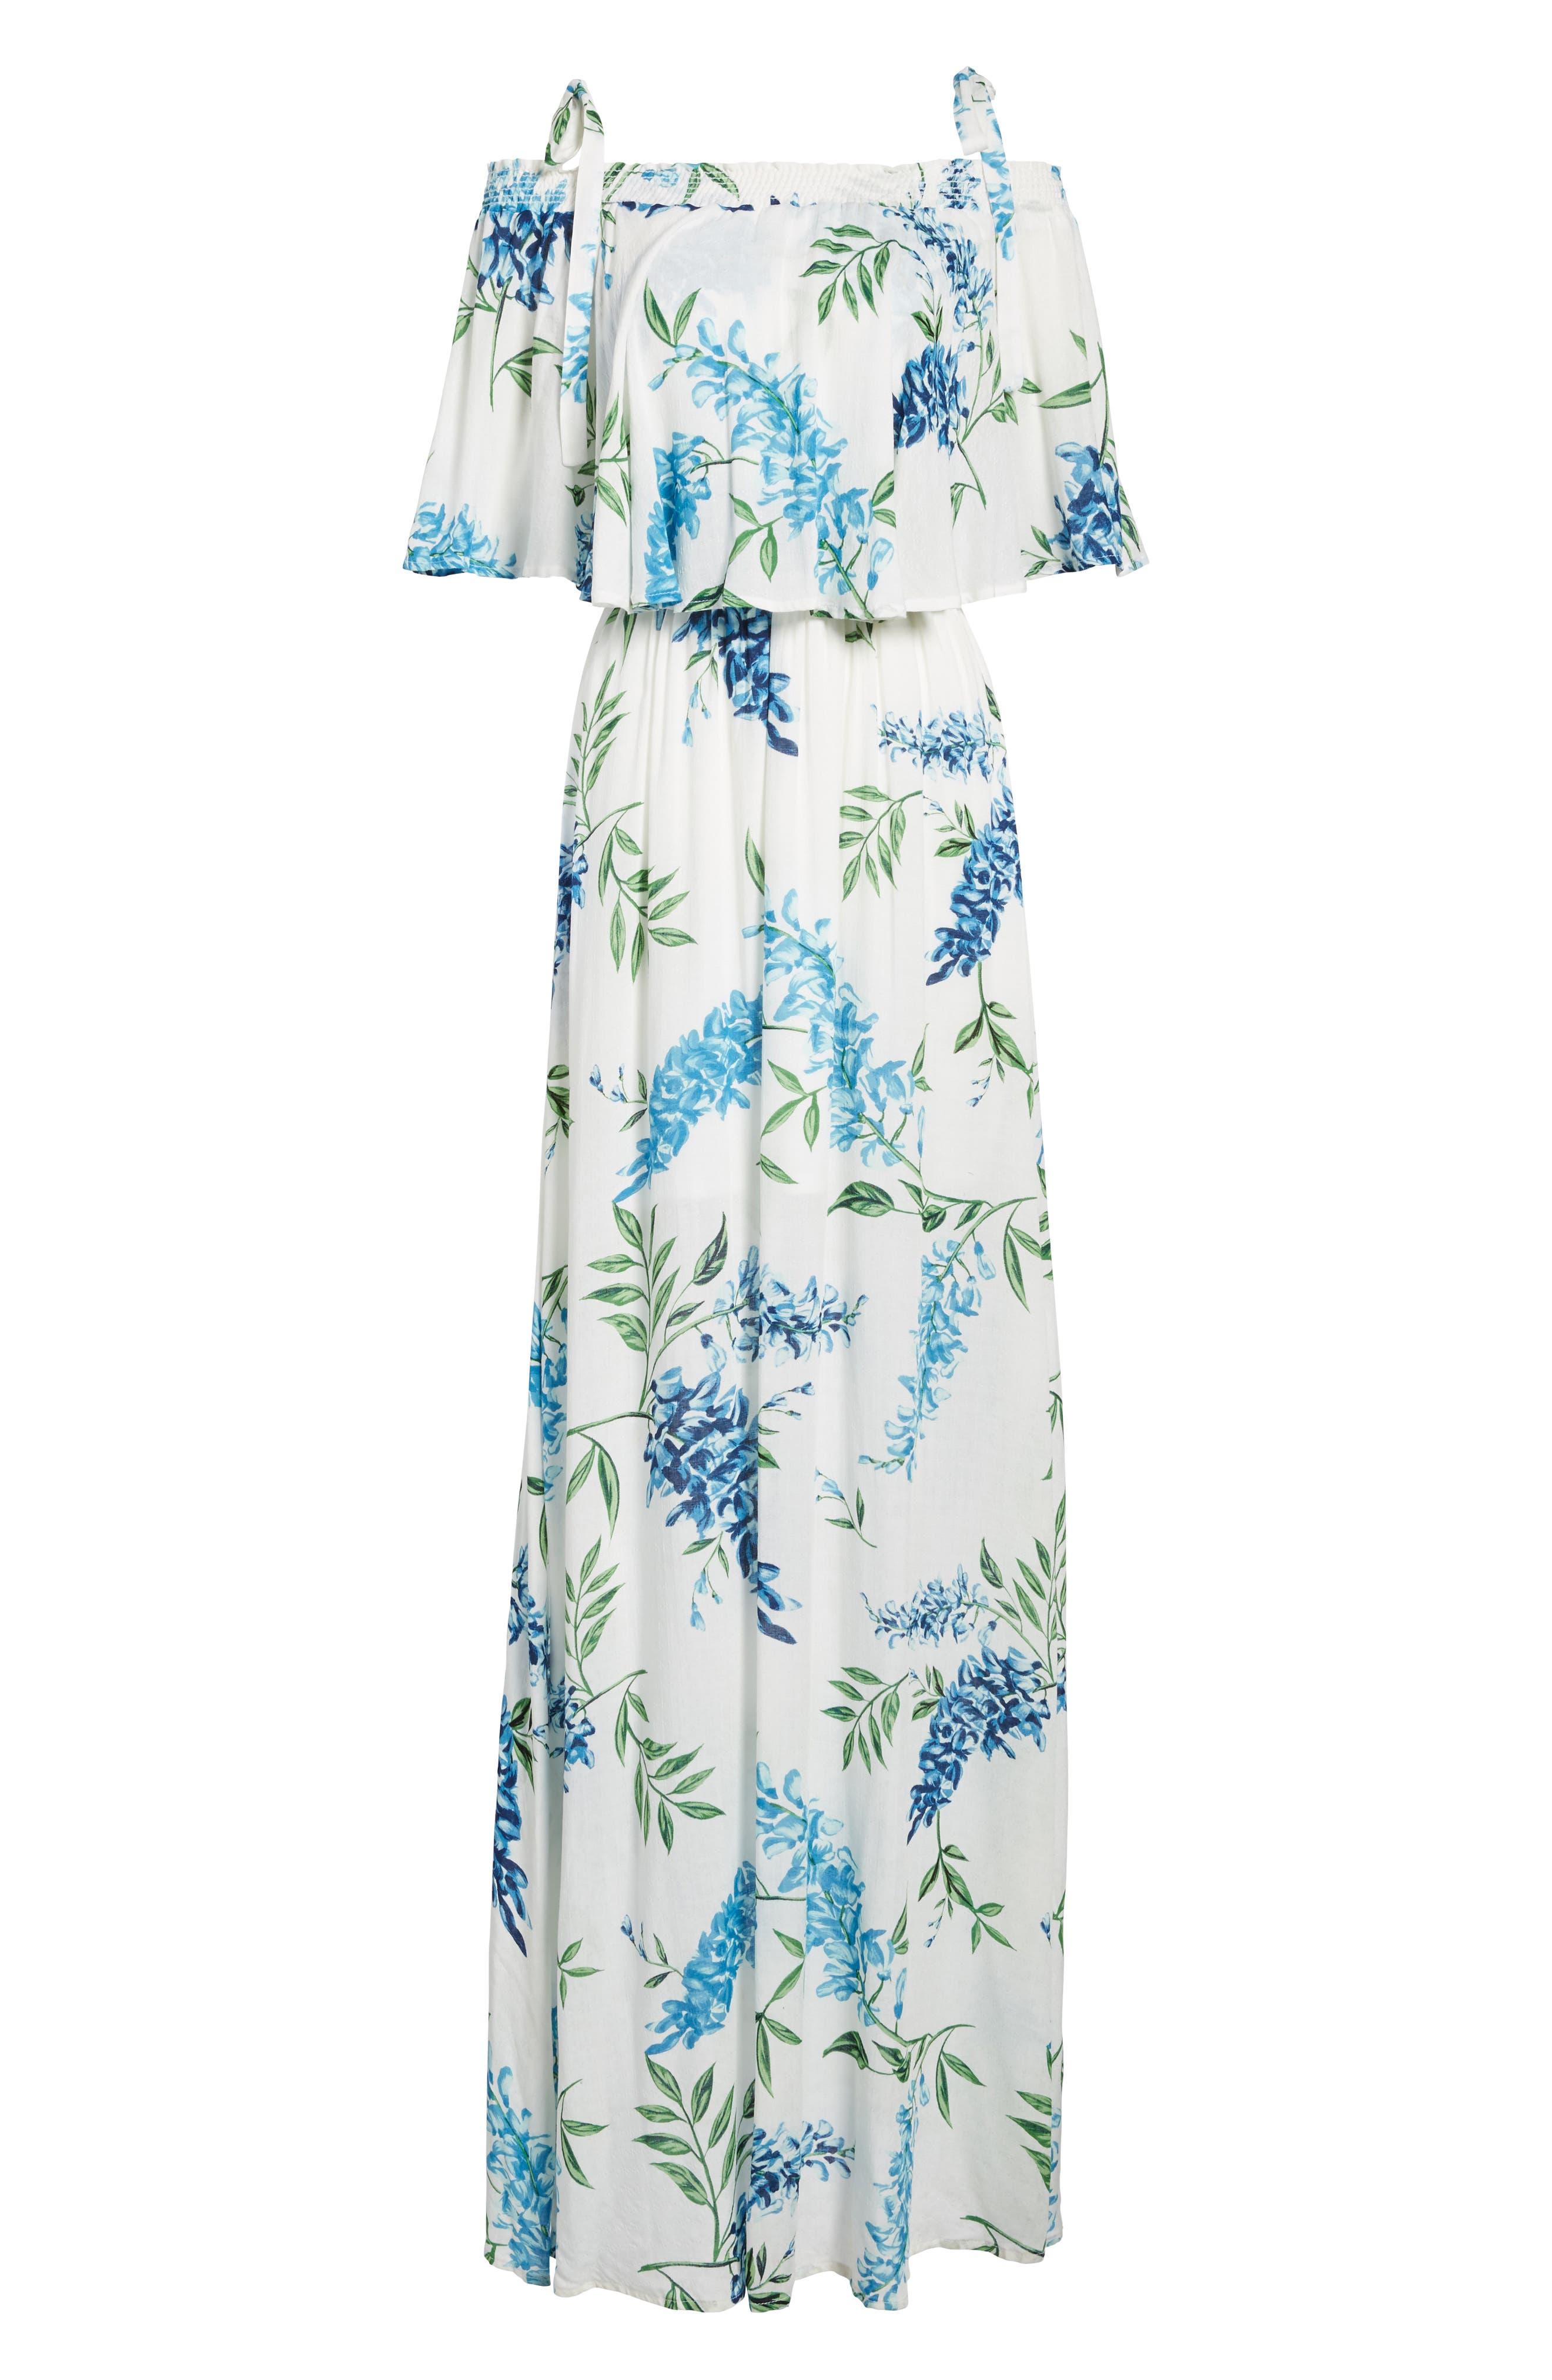 Nicola Ruffle Maxi Dress,                             Alternate thumbnail 6, color,                             Wisteria Wonder Challis